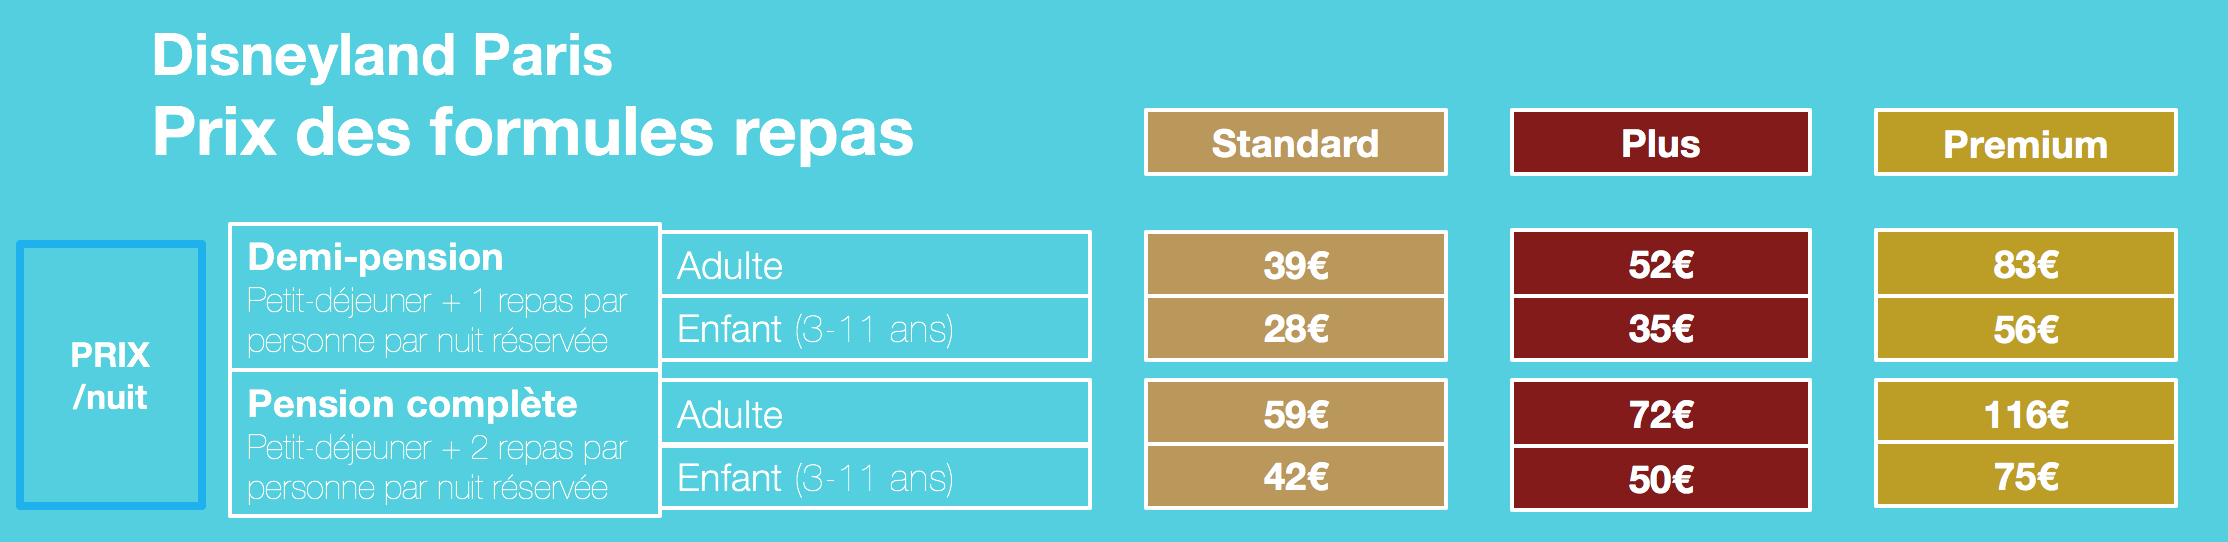 prix tarifs formules repas disneyland paris pension complete demi pension petit dejeuner